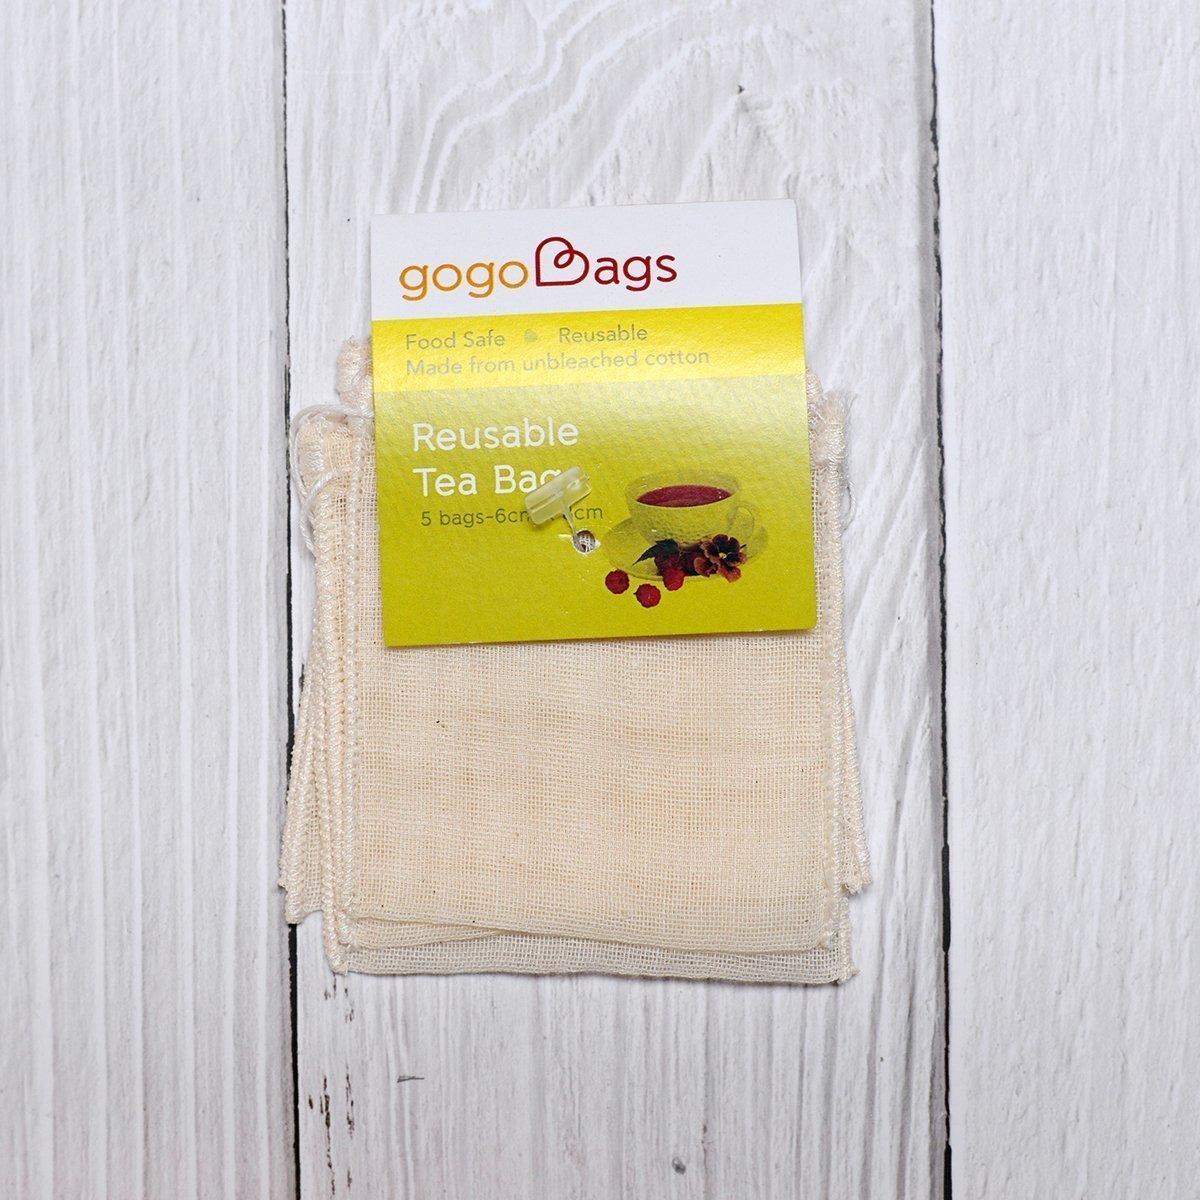 gogoBags tea bag